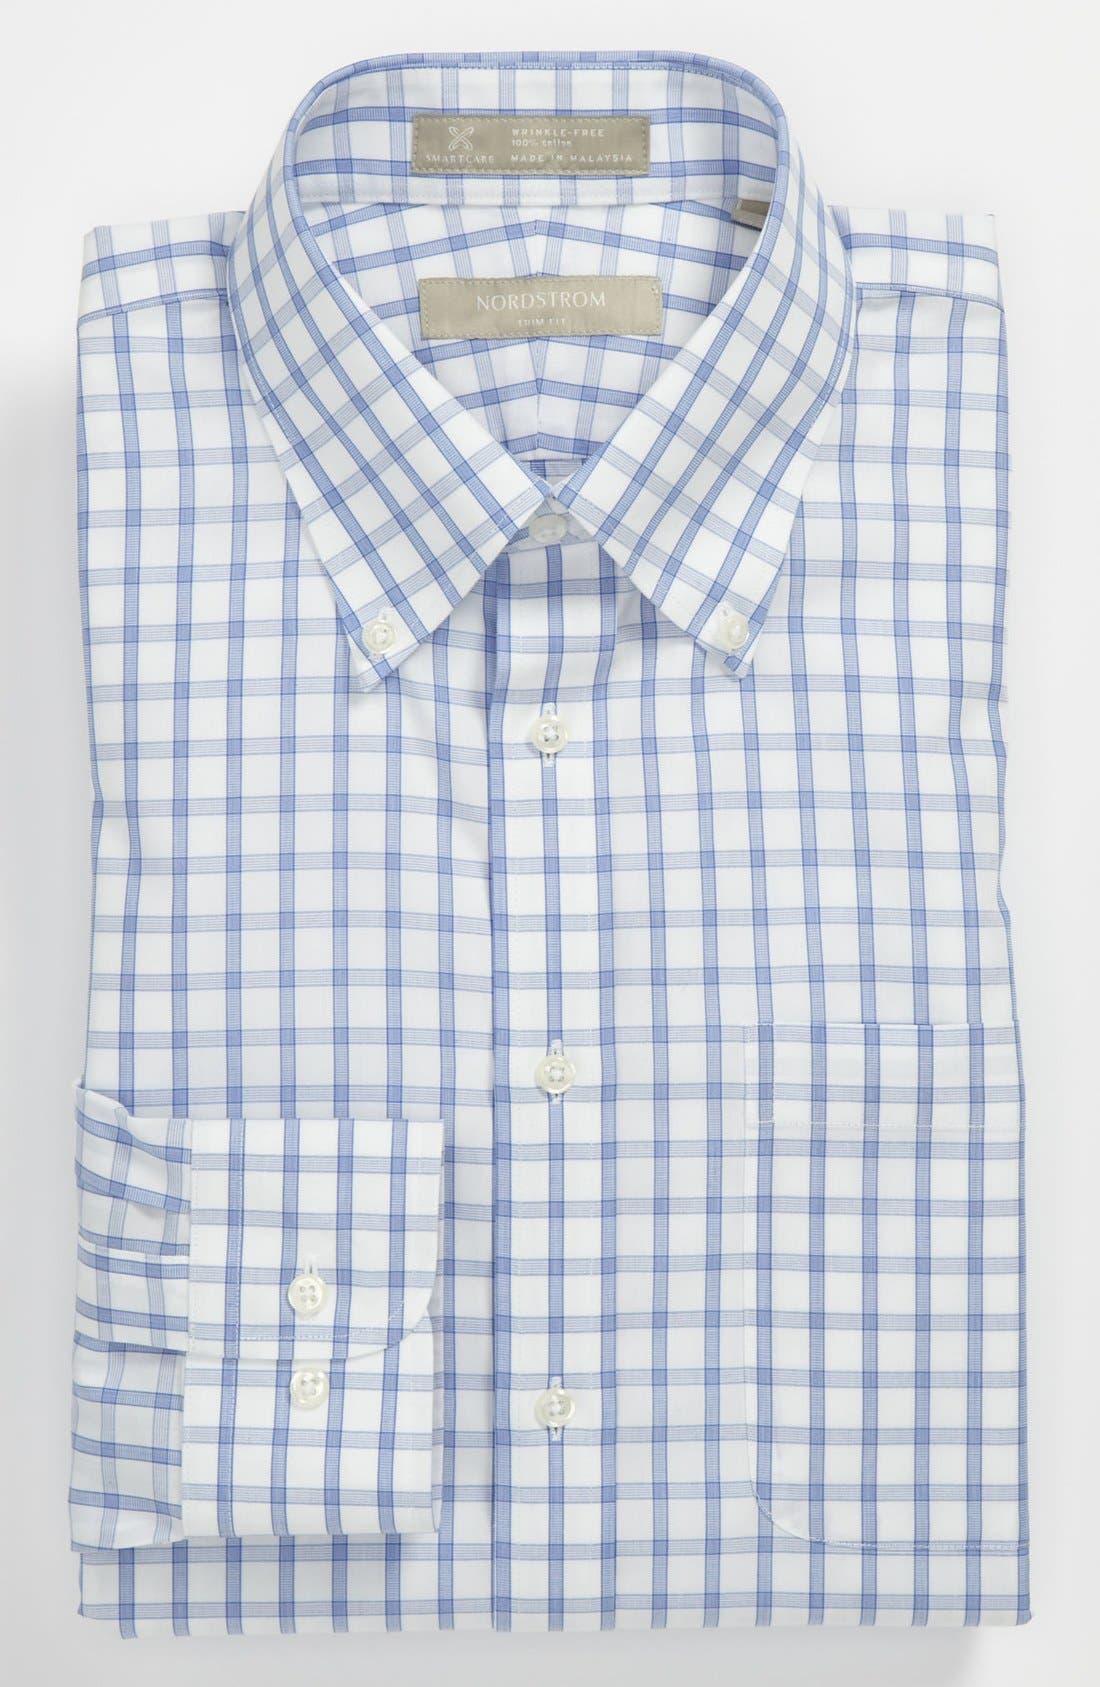 Alternate Image 1 Selected - Nordstrom Smartcare™ Wrinkle Free Trim Fit Check Dress Shirt